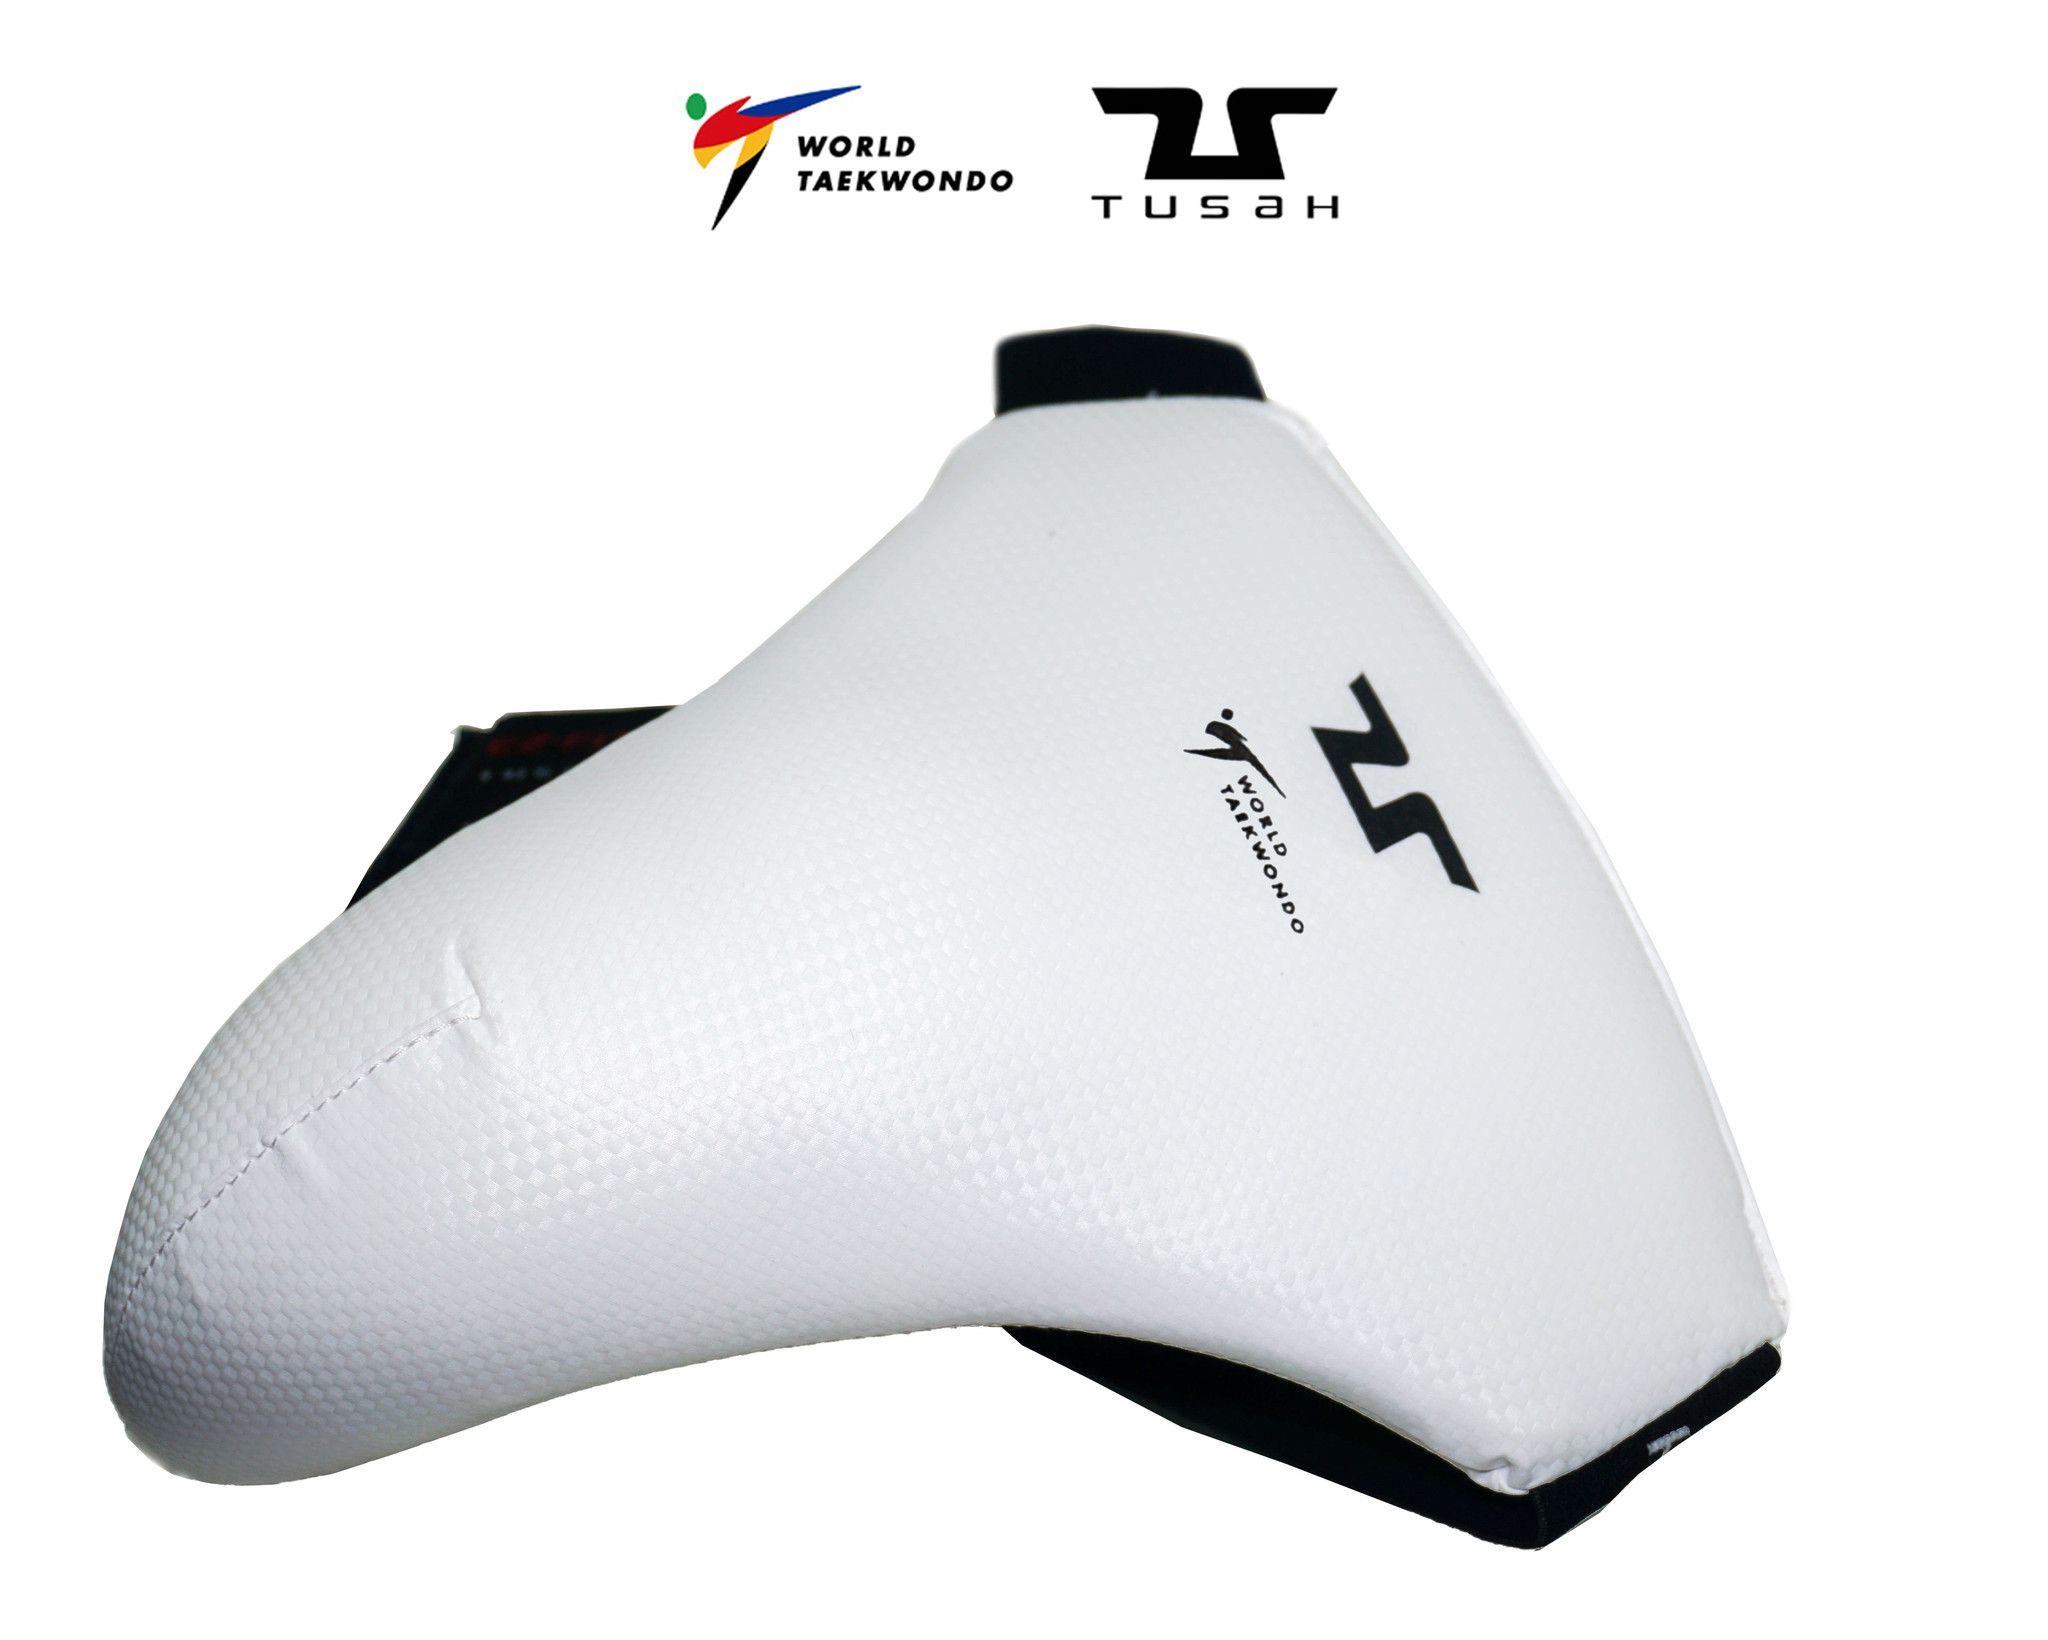 Tusah - Conchiglia Maschile per Taekwondo Omologata WT protezione inguine